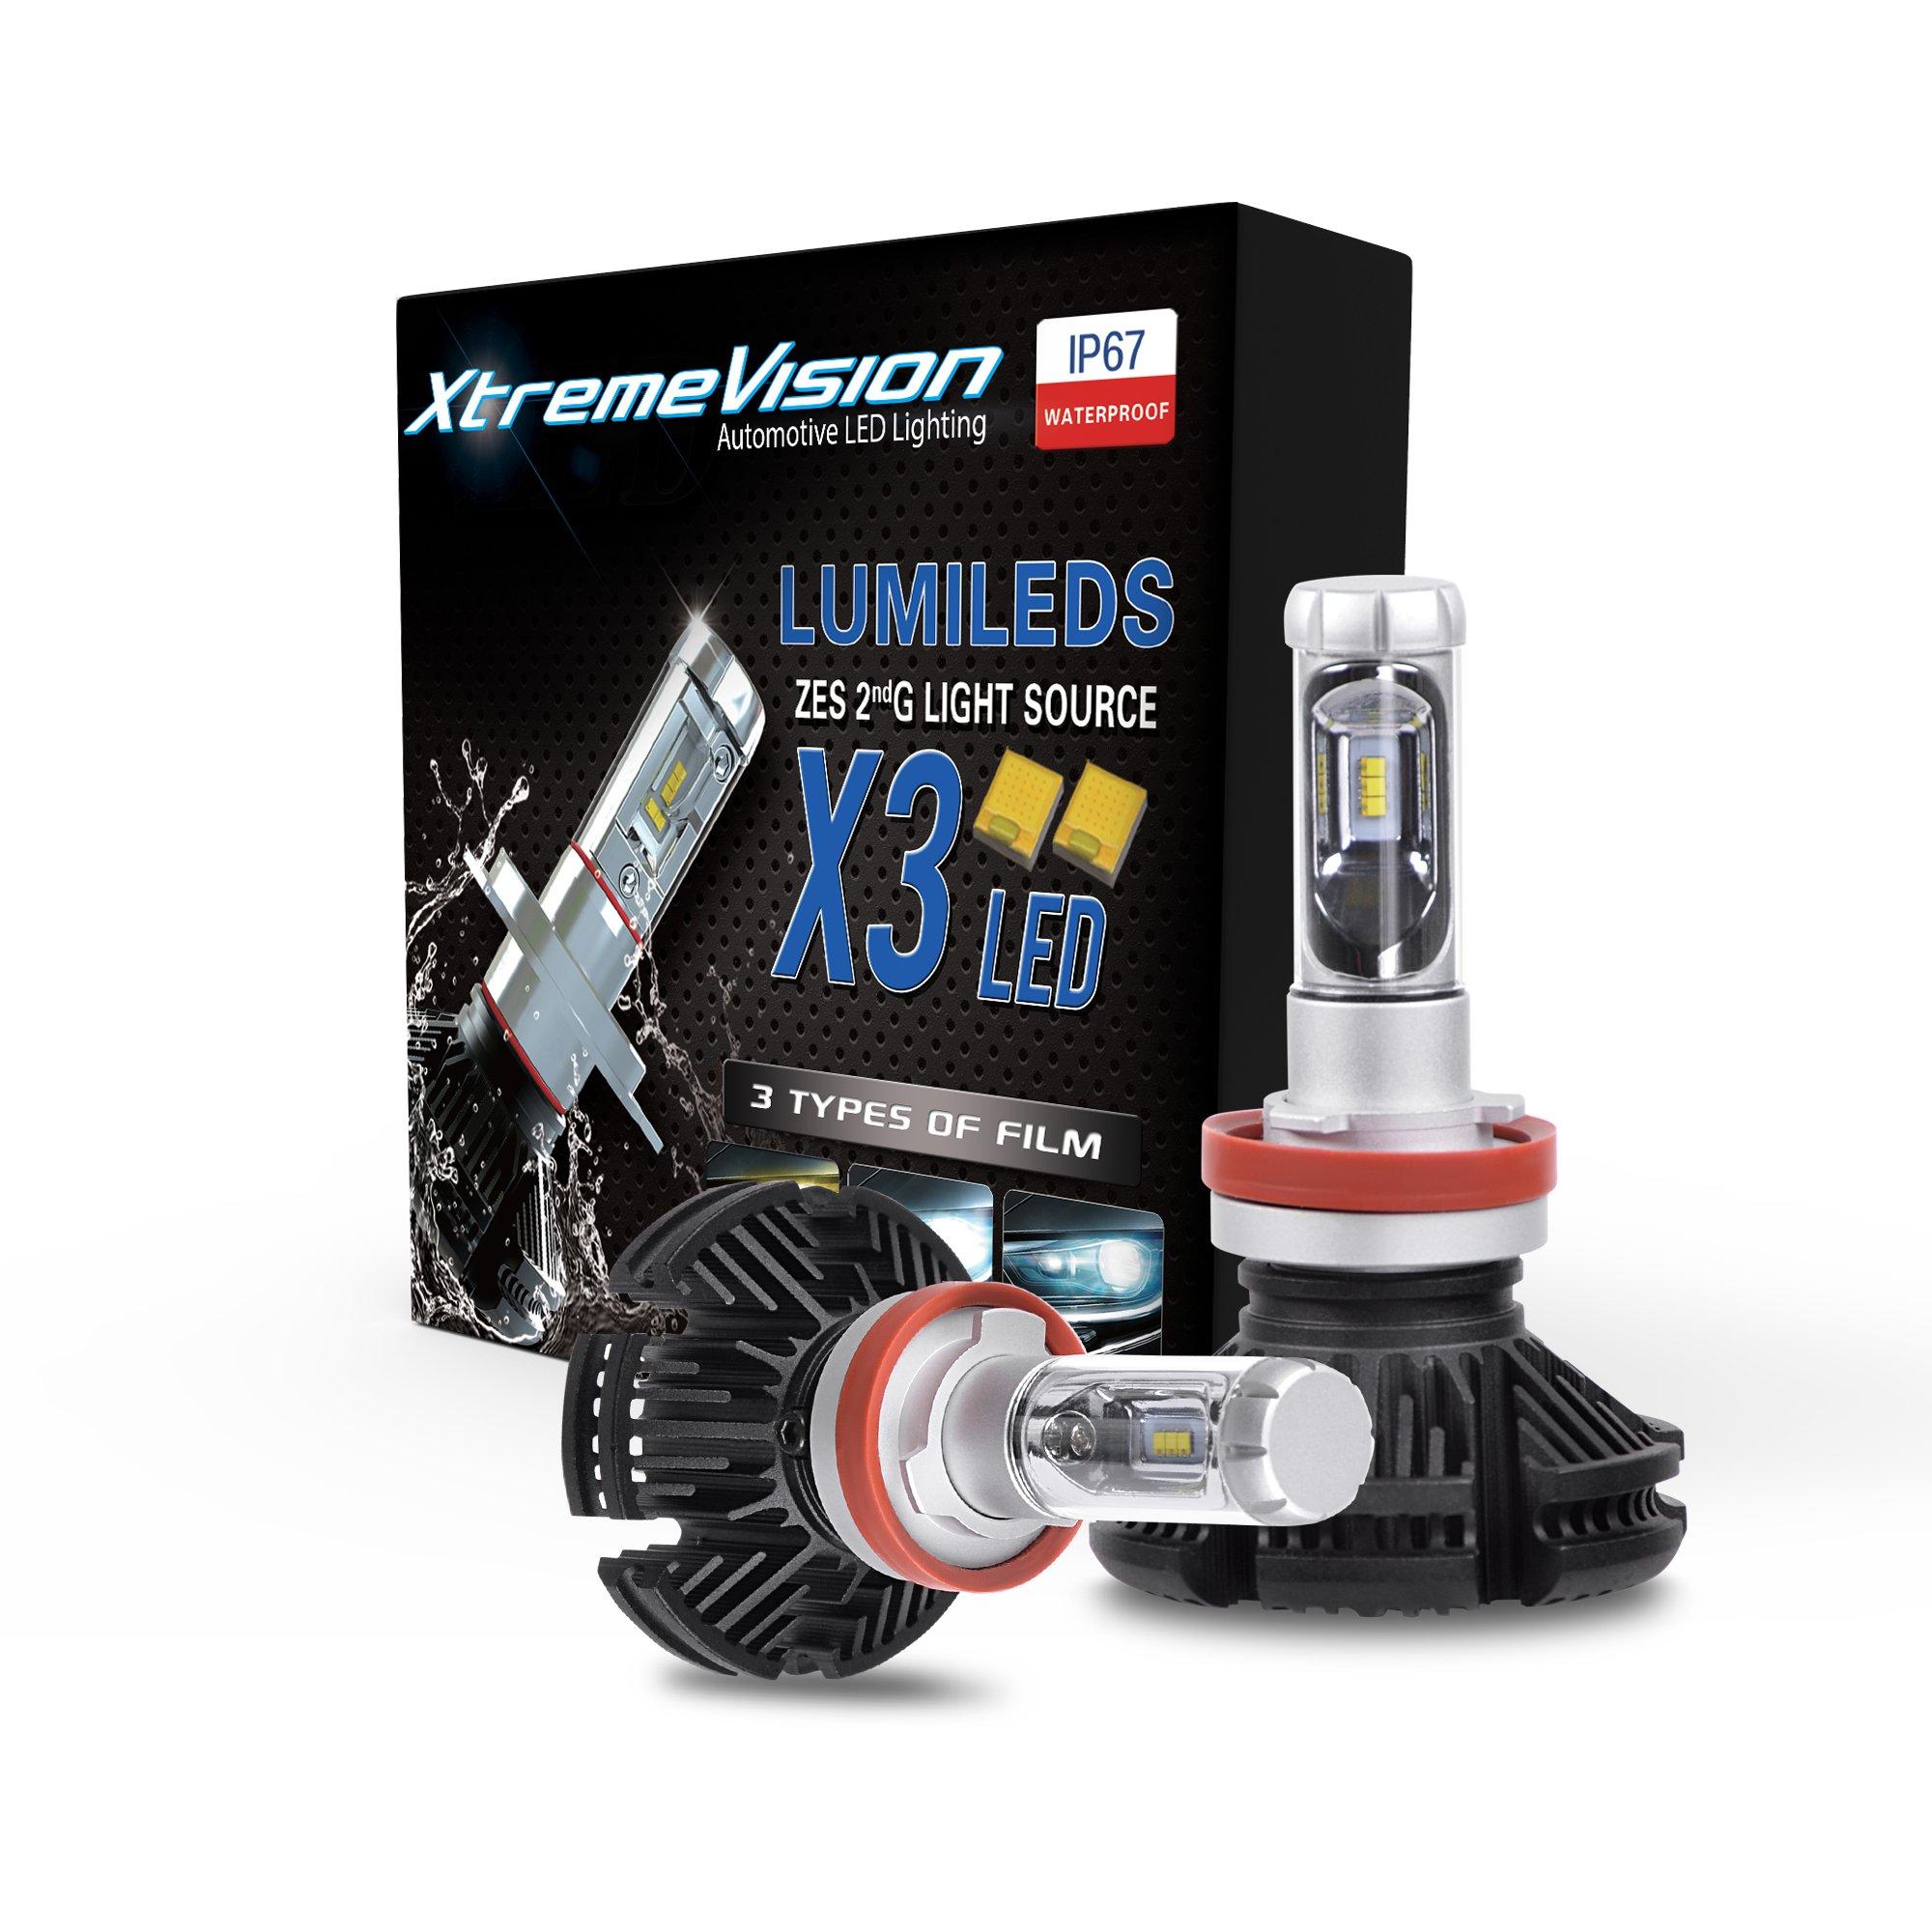 XtremeVision X3 50W 12,000LM - H11 LED Headlight Conversion Kit - 3000K 6500K 8000K PHILIPS ZES LED - 2018 Model